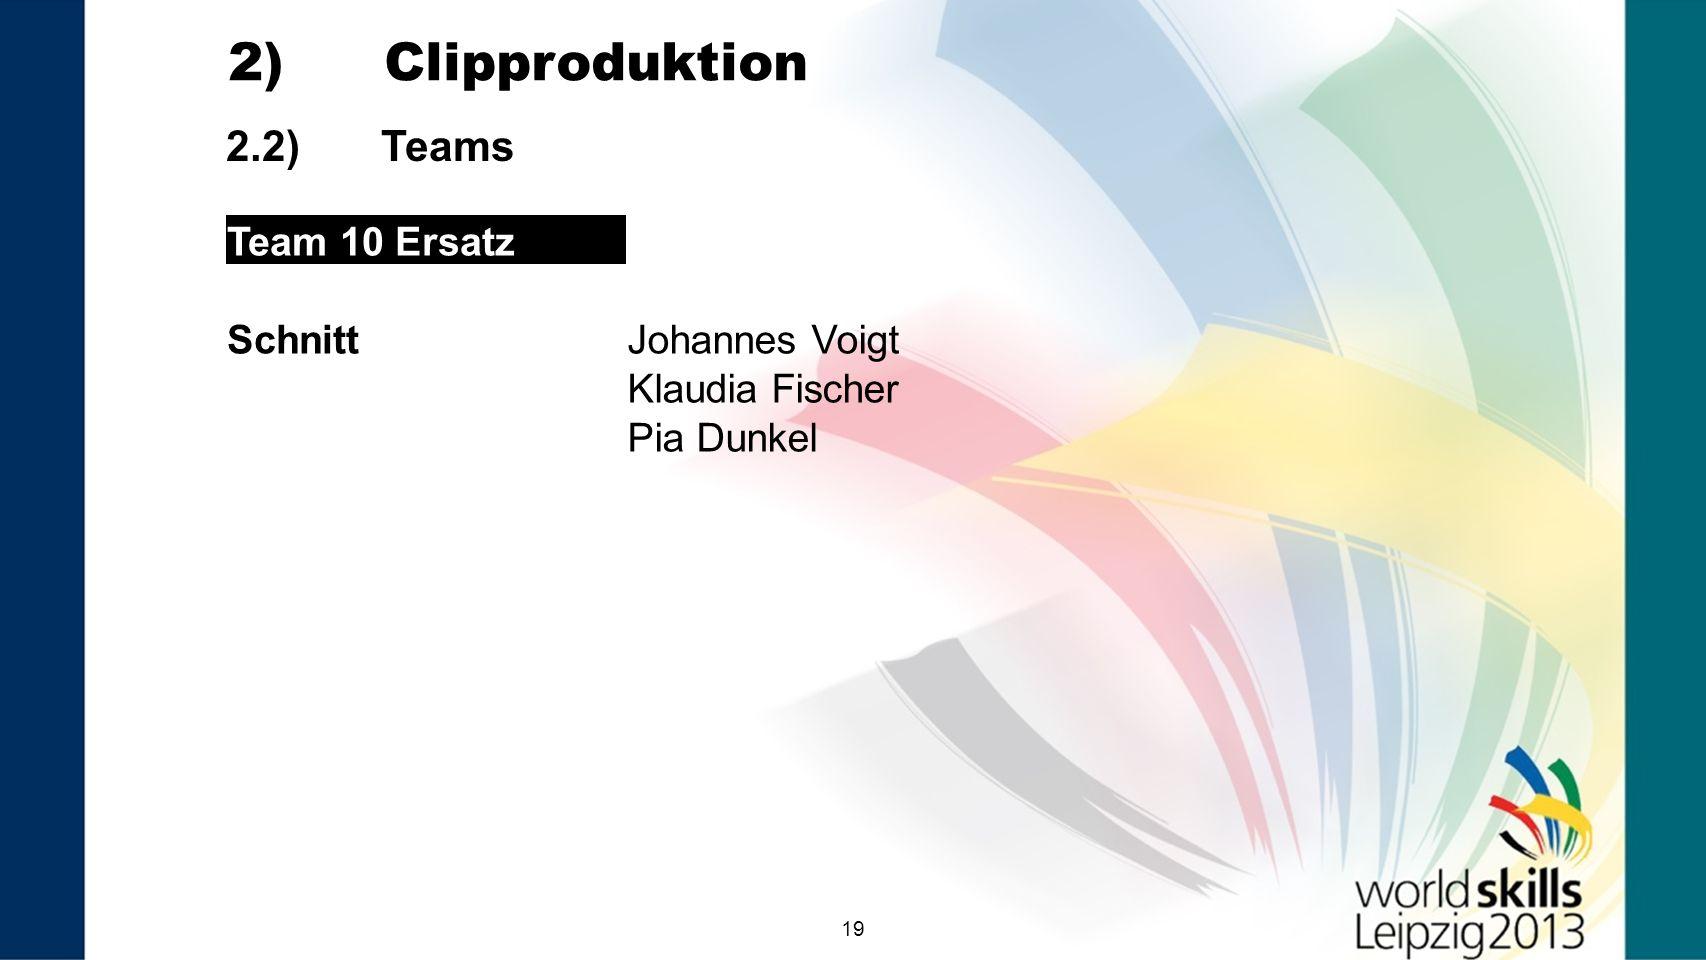 19 2.2) Teams 2) Clipproduktion Team 10 Ersatz SchnittJohannes Voigt Klaudia Fischer Pia Dunkel